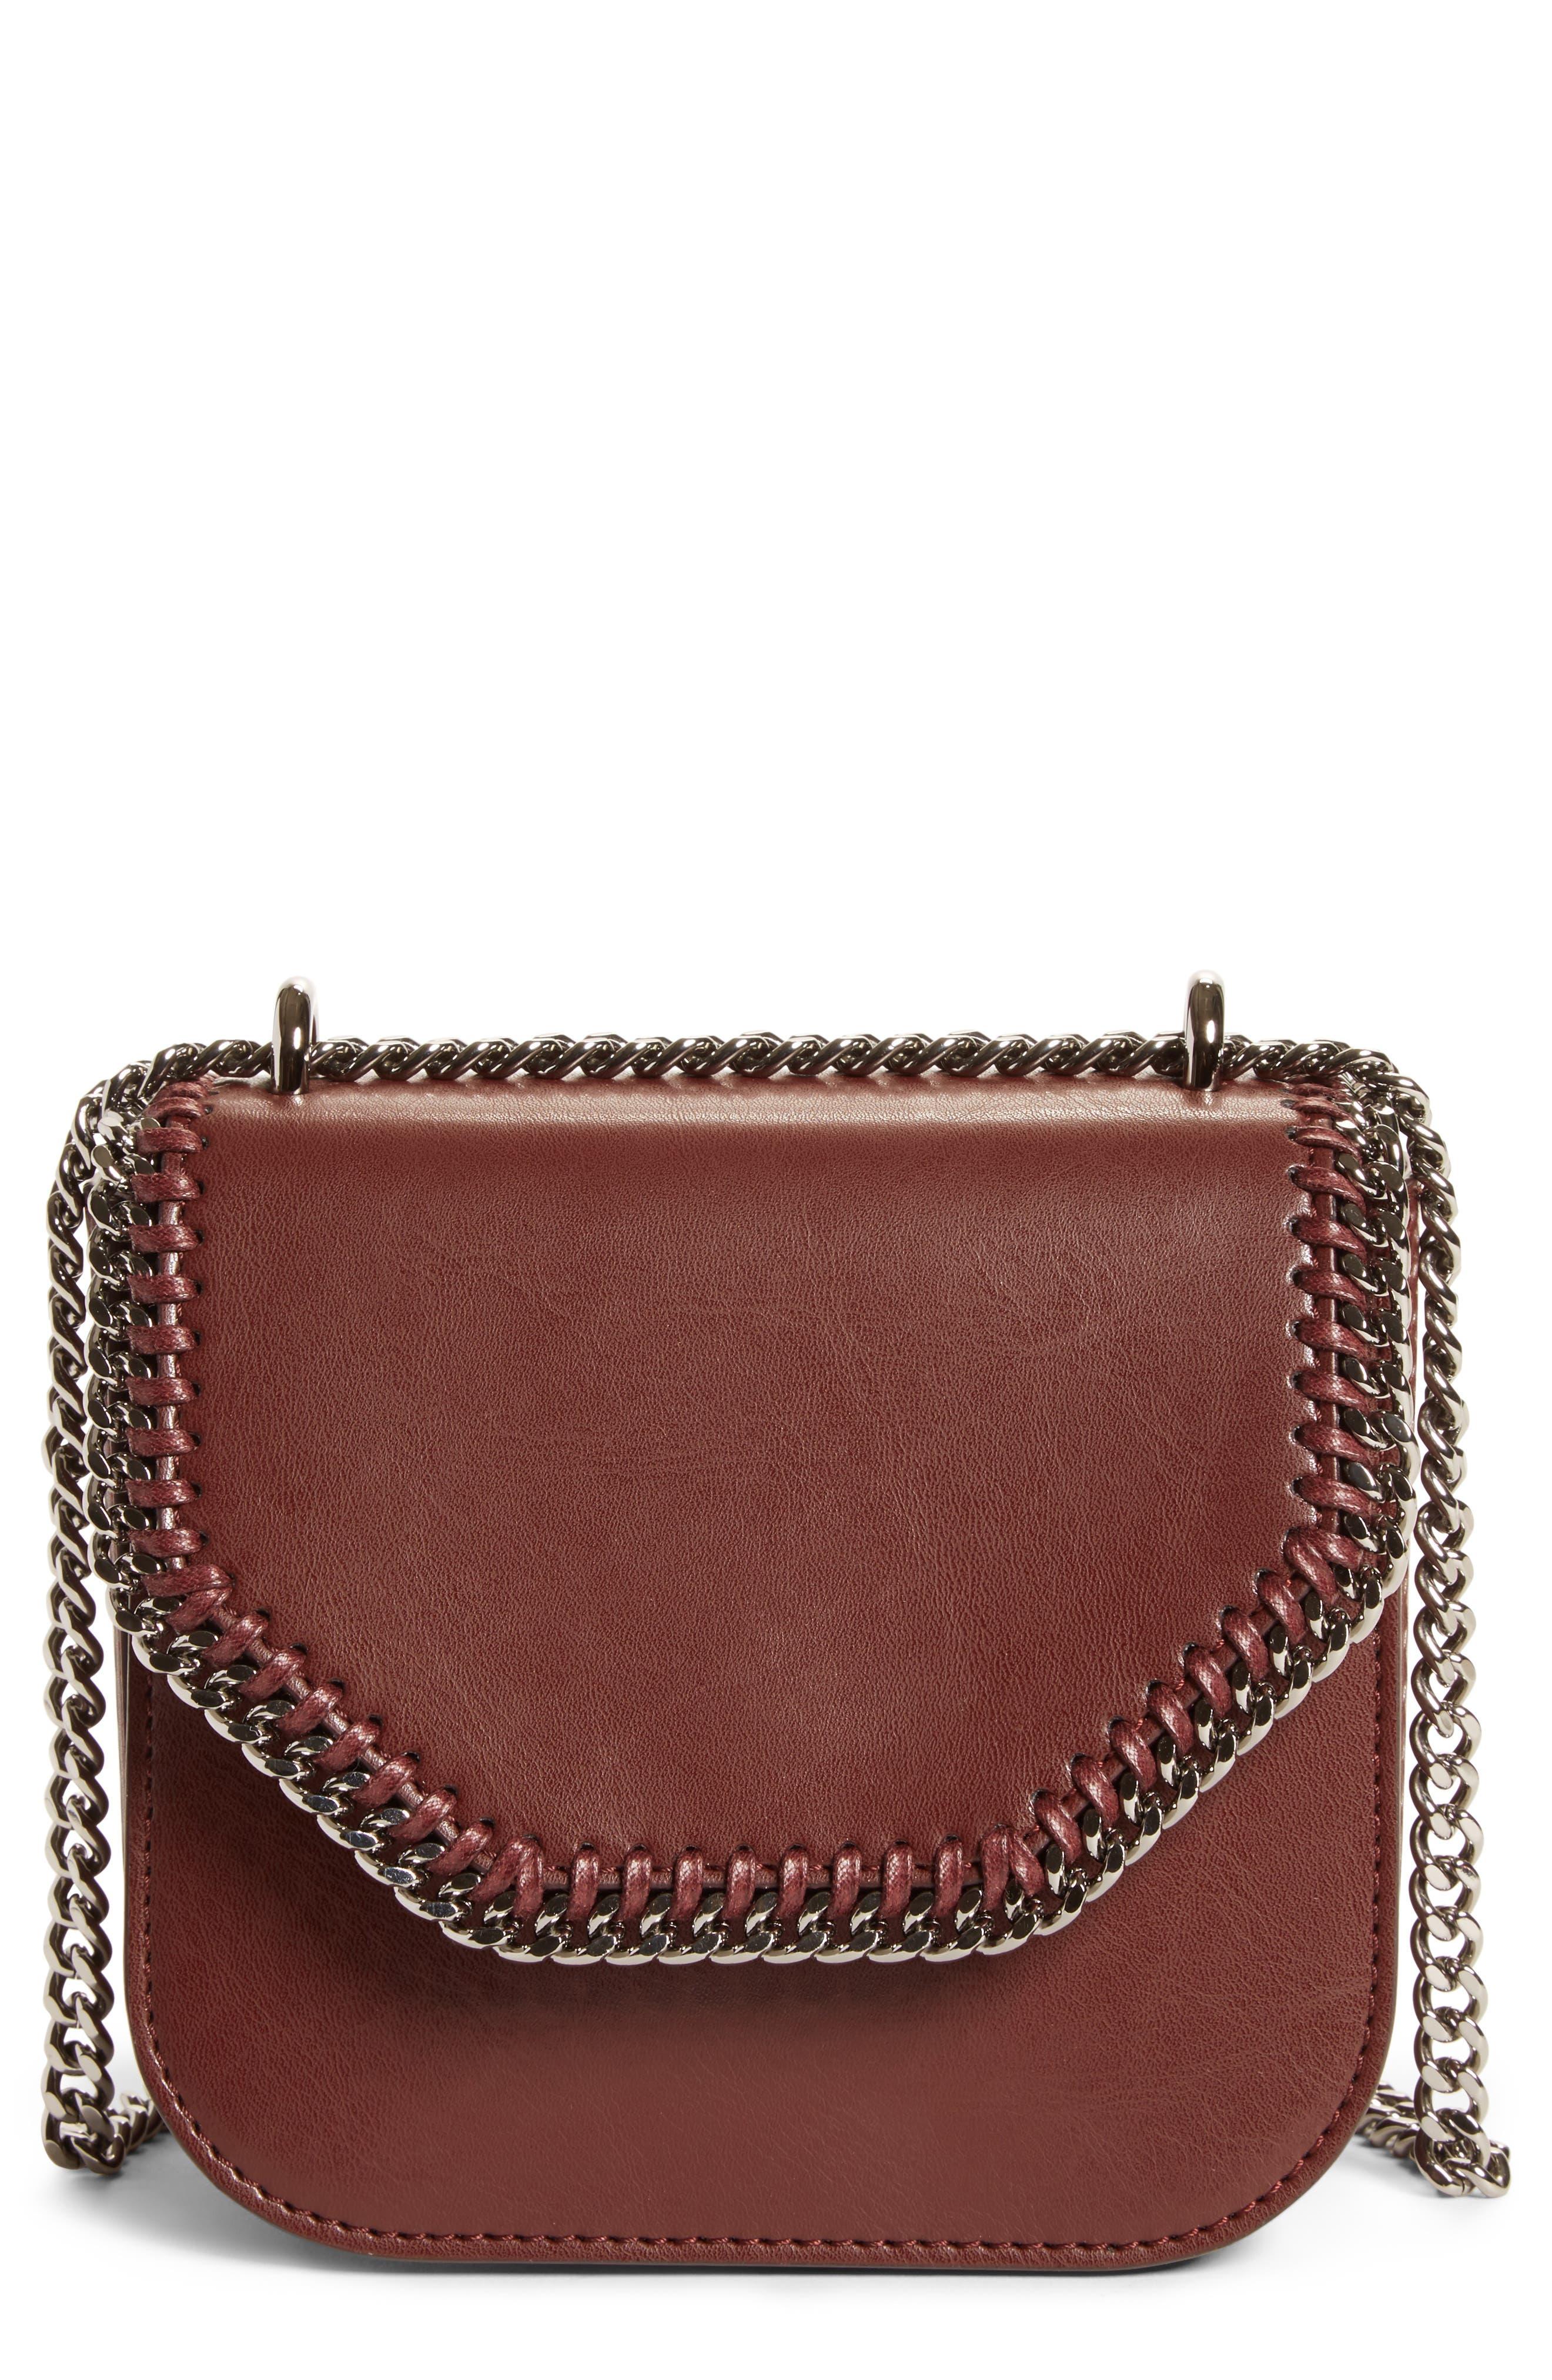 Stella McCartney Small Falabella Box Alter Nappa Faux Leather Crossbody Bag